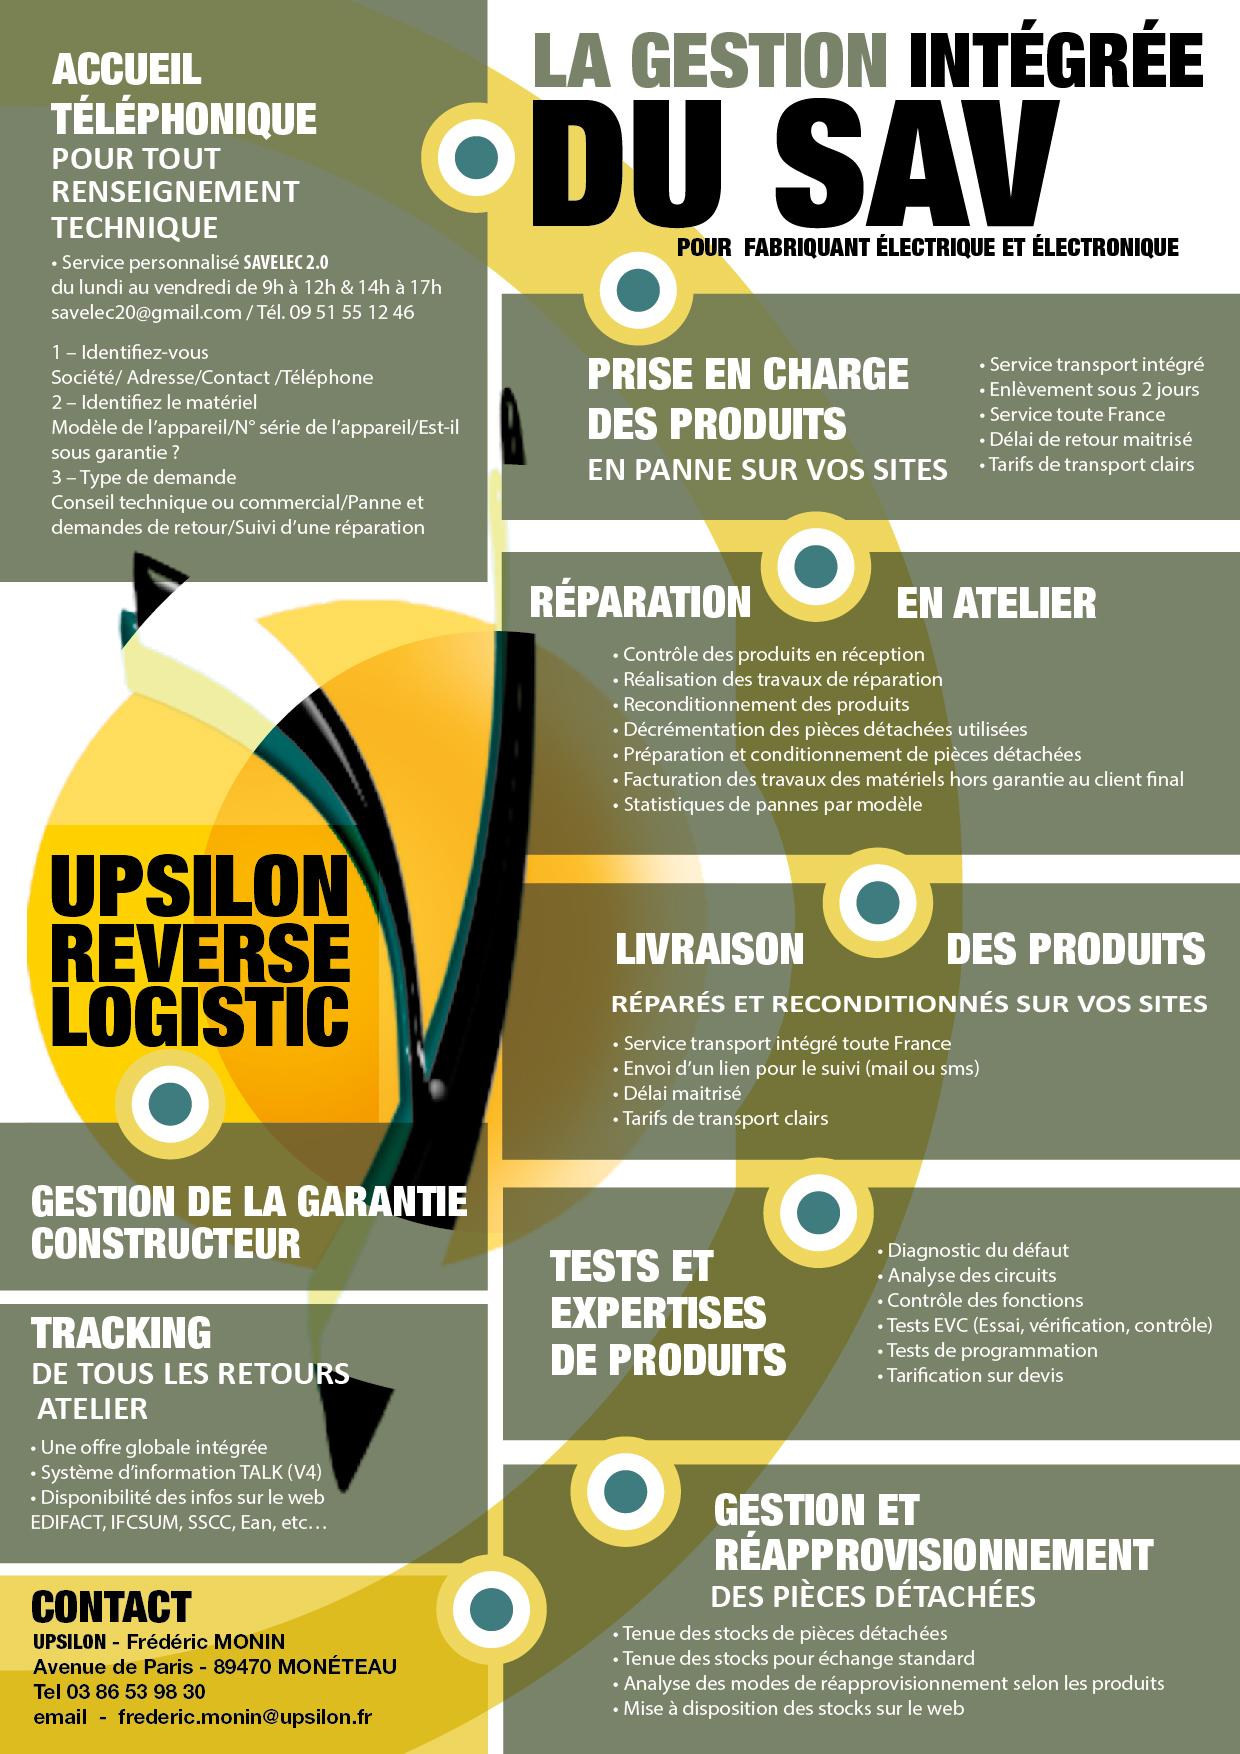 UPSILON